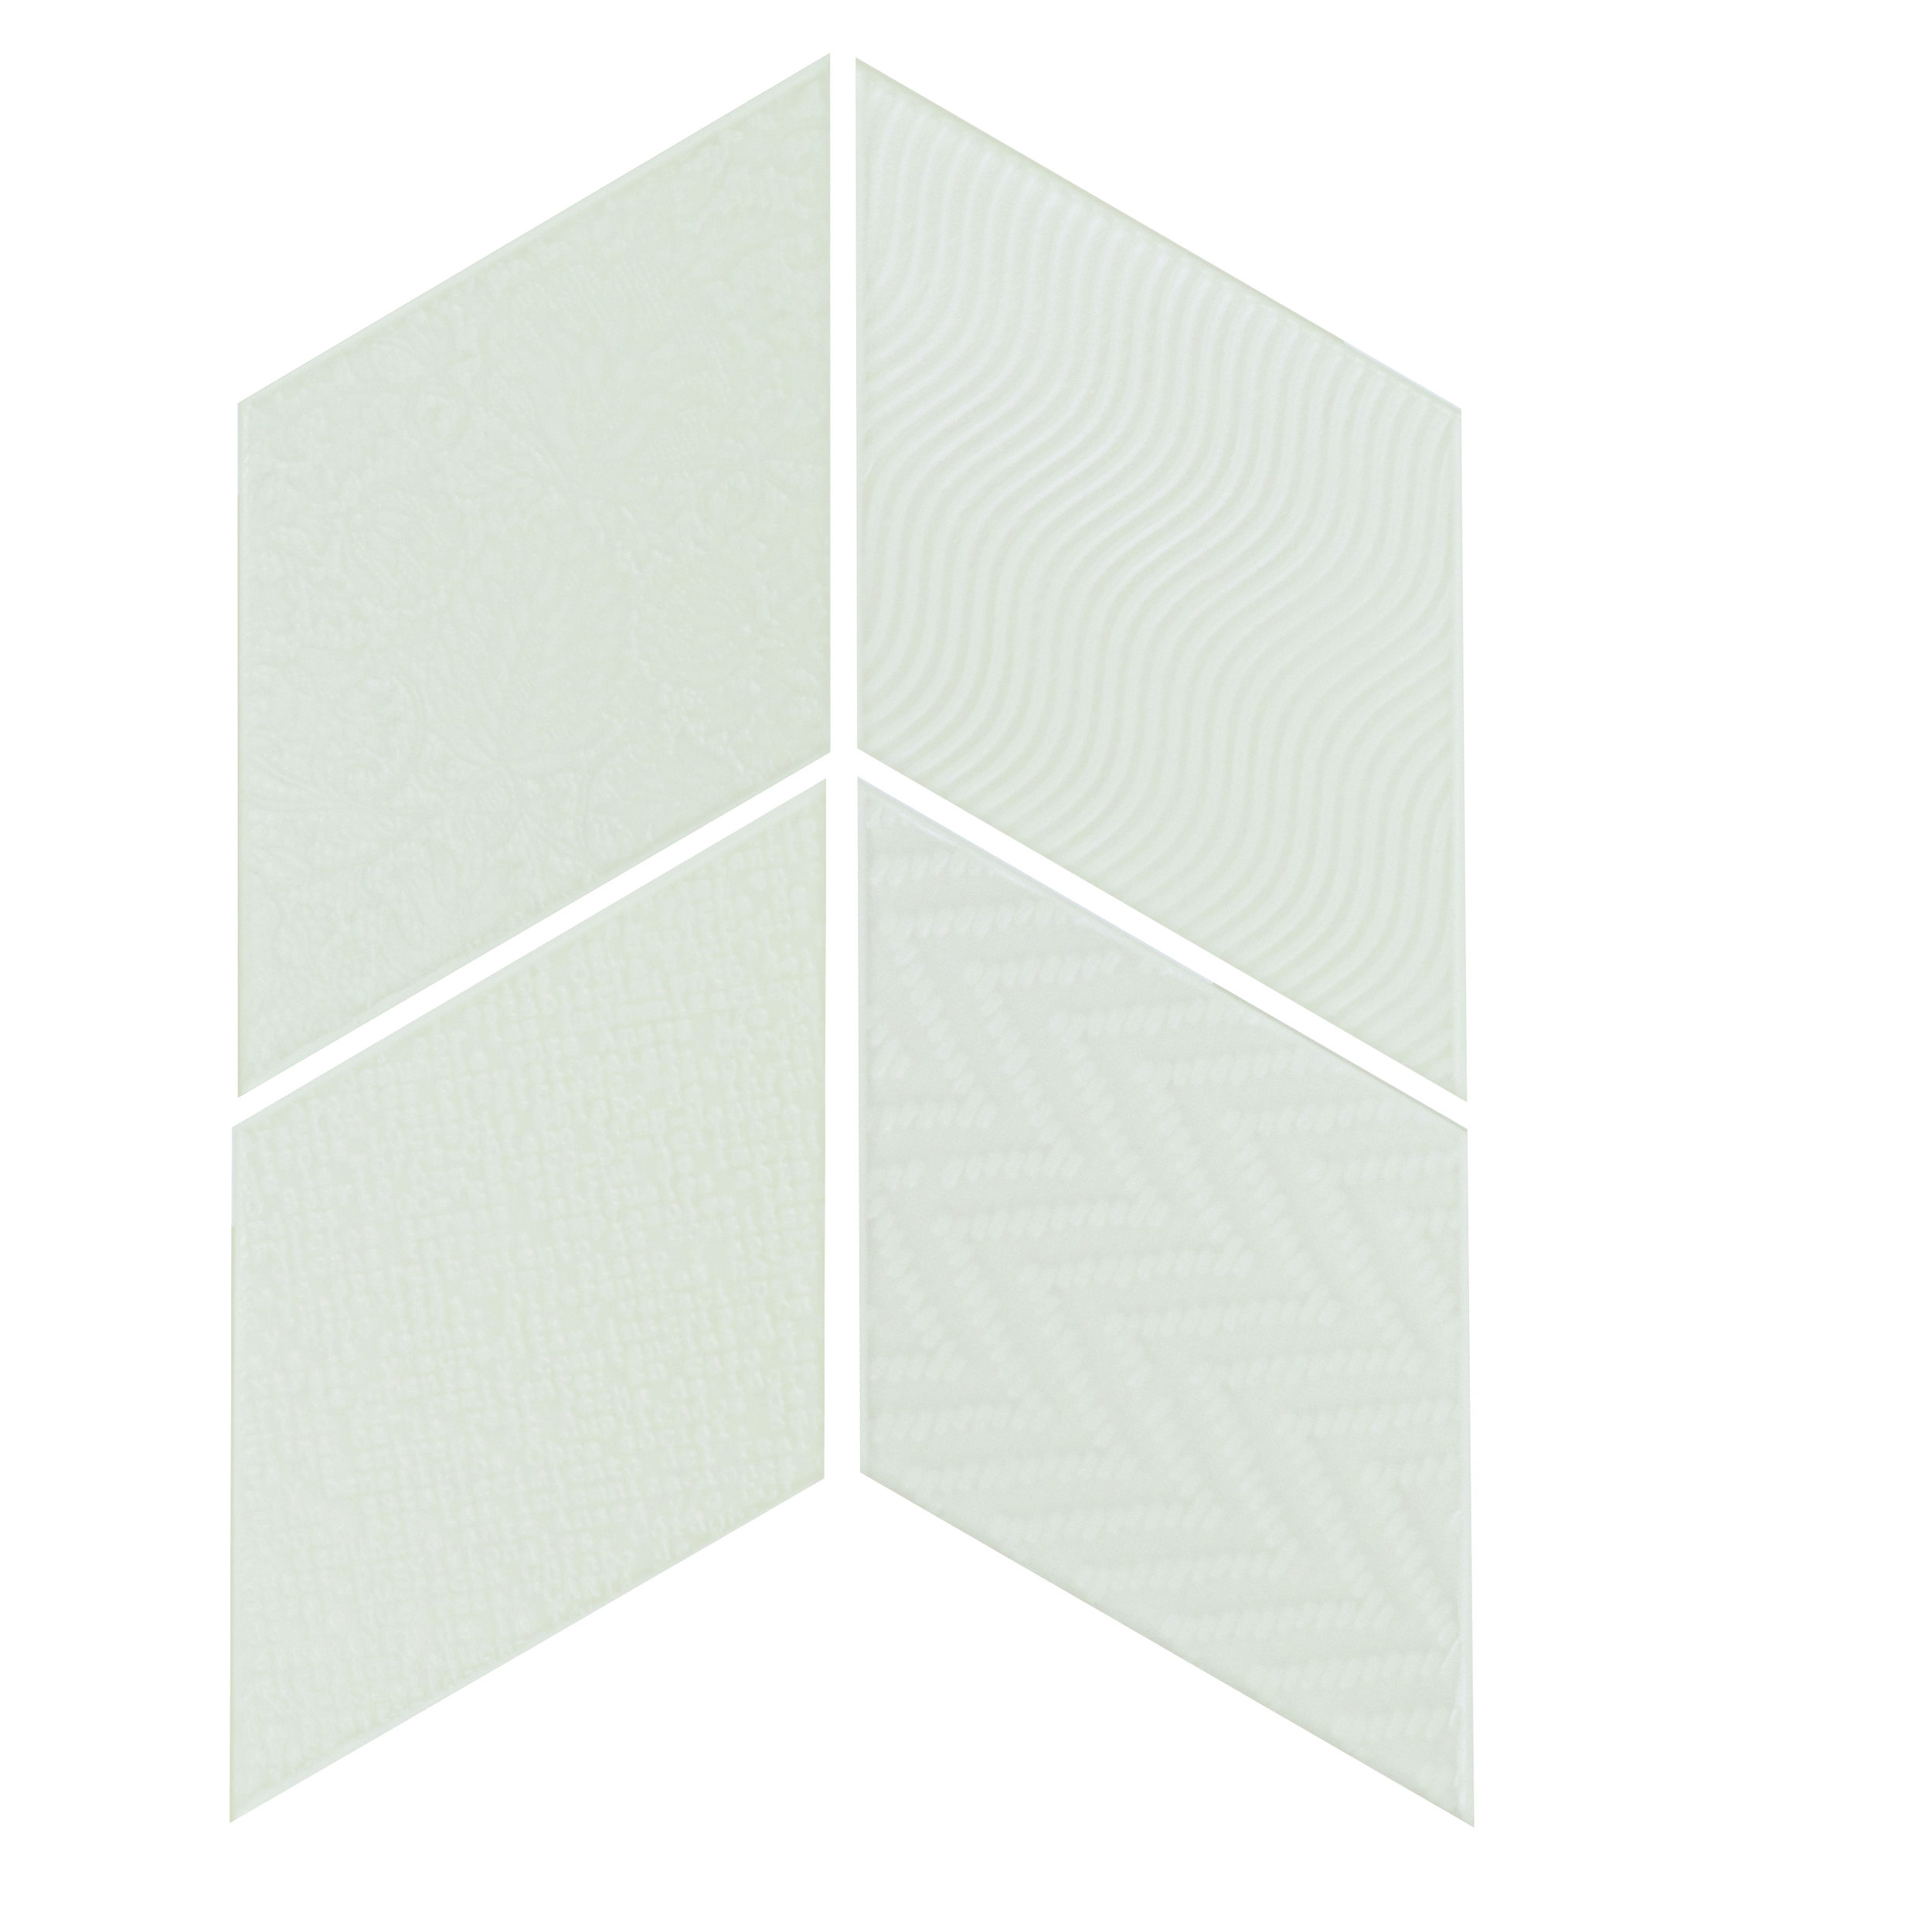 LxH Corniche de plafond 1.282 Polyur/éthane 40 x 69mm